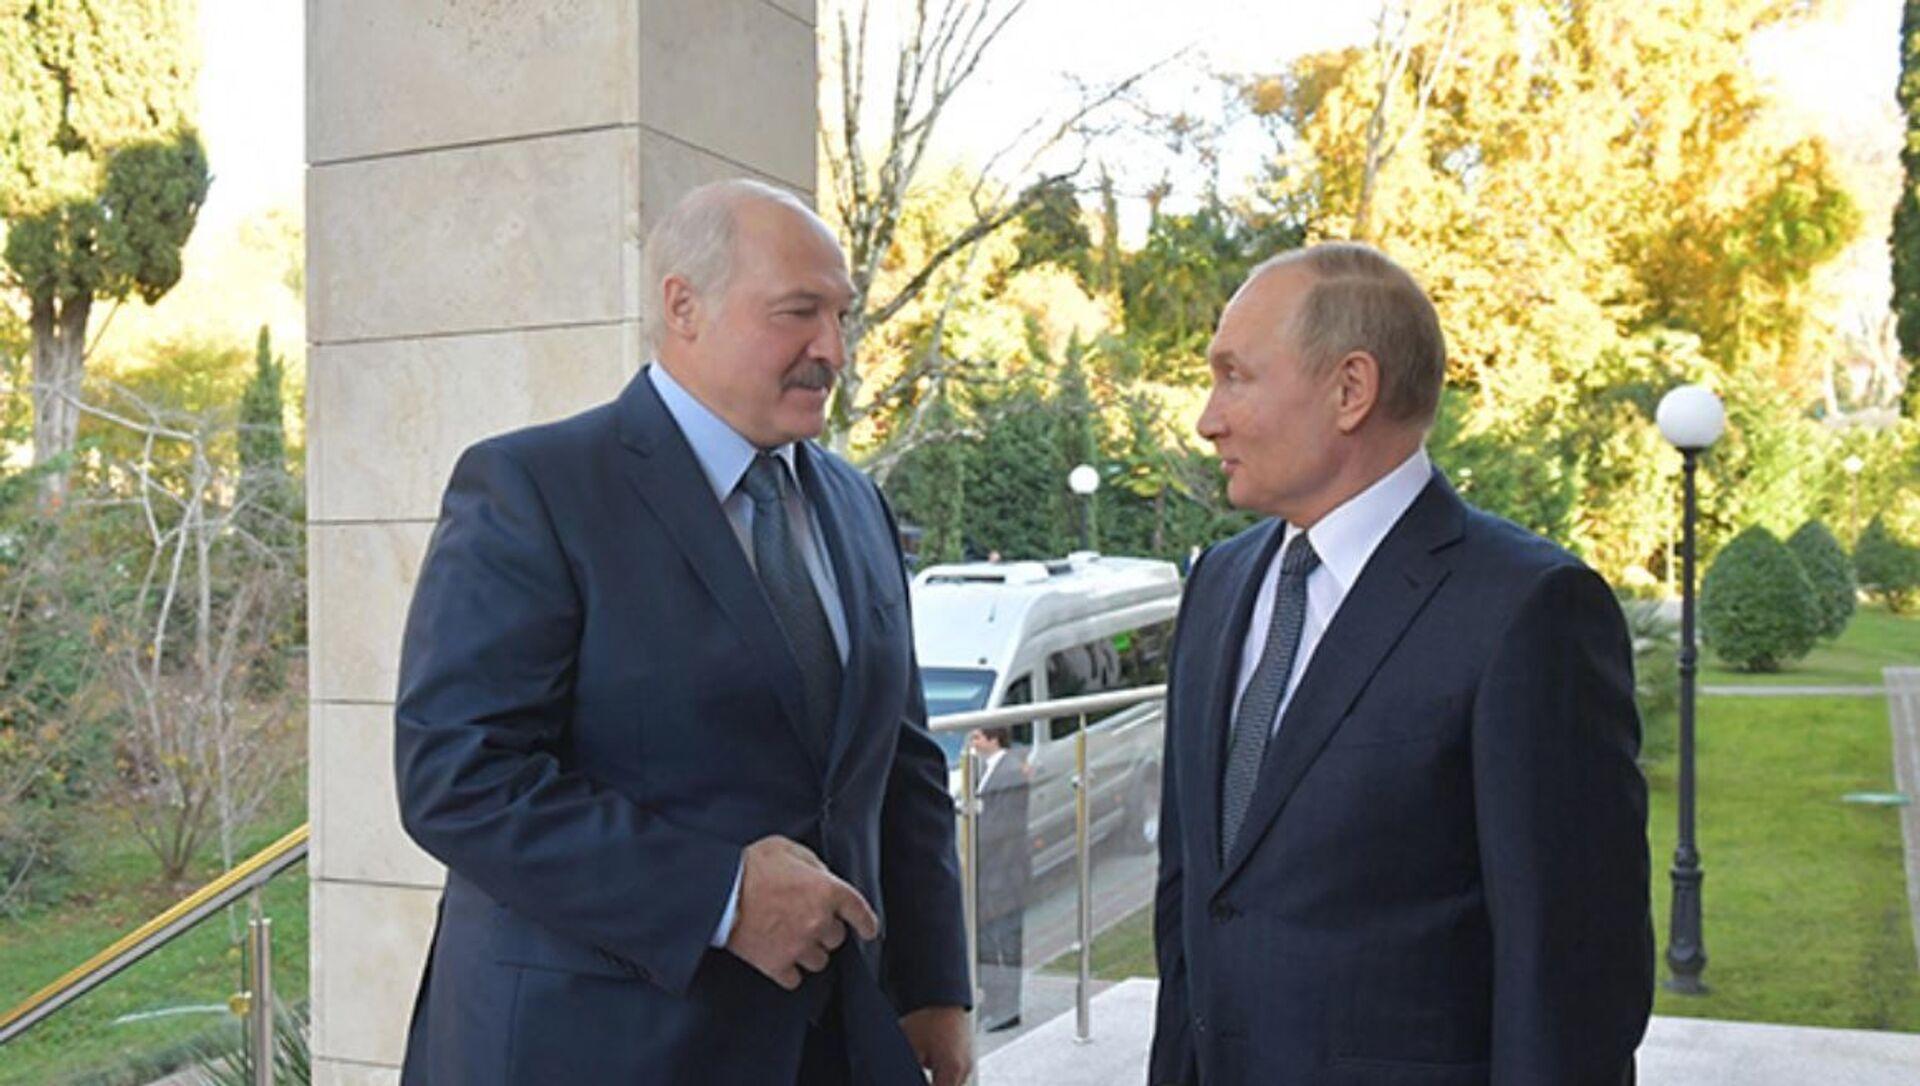 Президенты Александр Лукашенко и Владимир Путин - Sputnik Беларусь, 1920, 15.04.2021